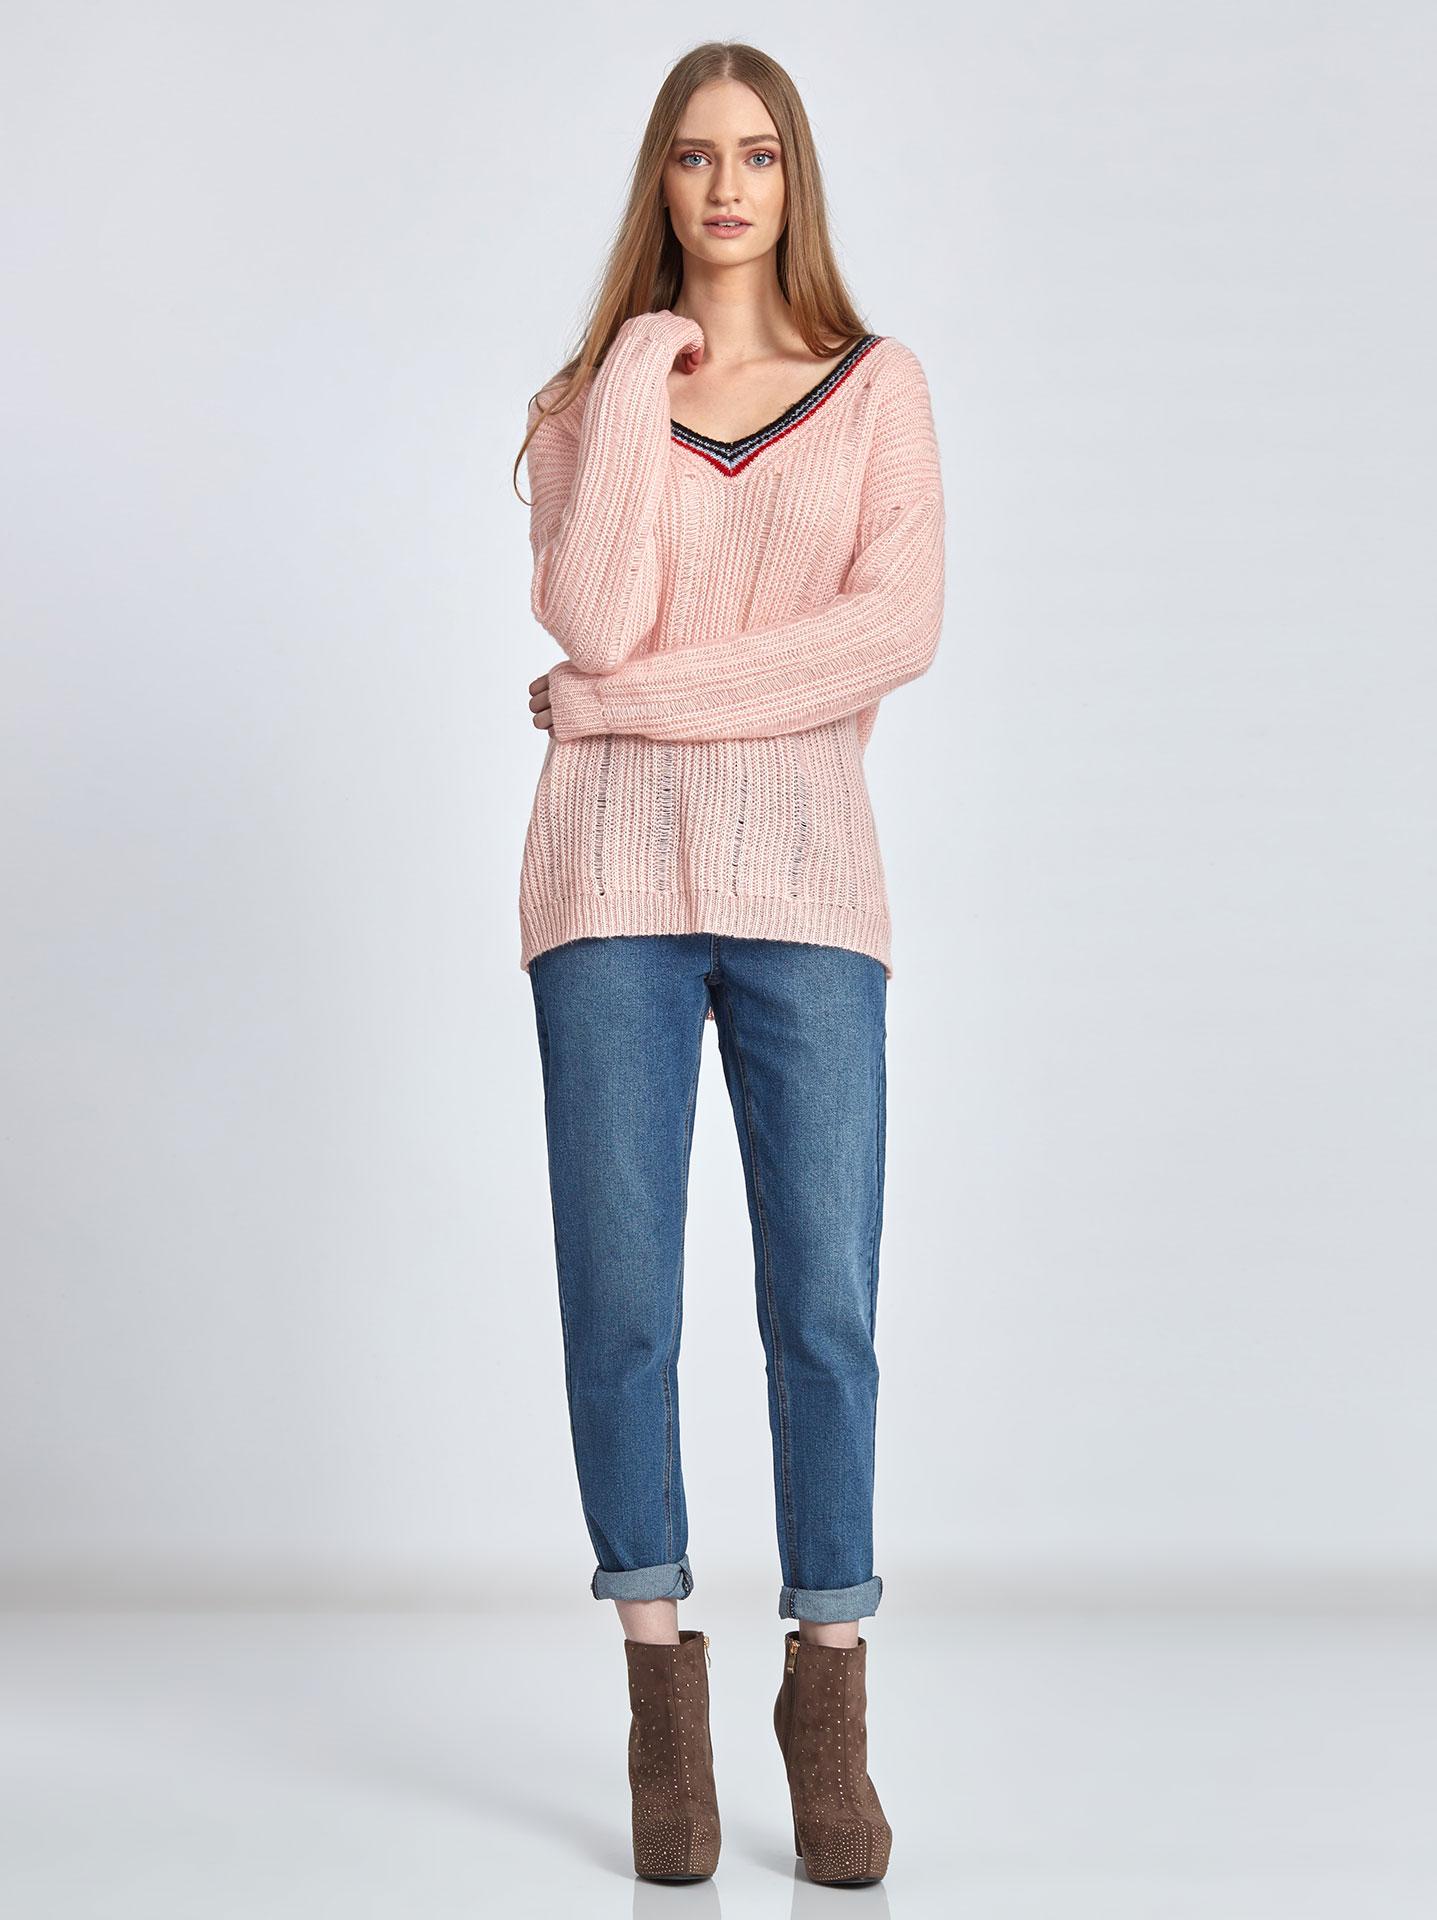 c39339786348 Πλεκτό πουλόβερ με ρίγες στη λαιμόκοψη σε ροζ